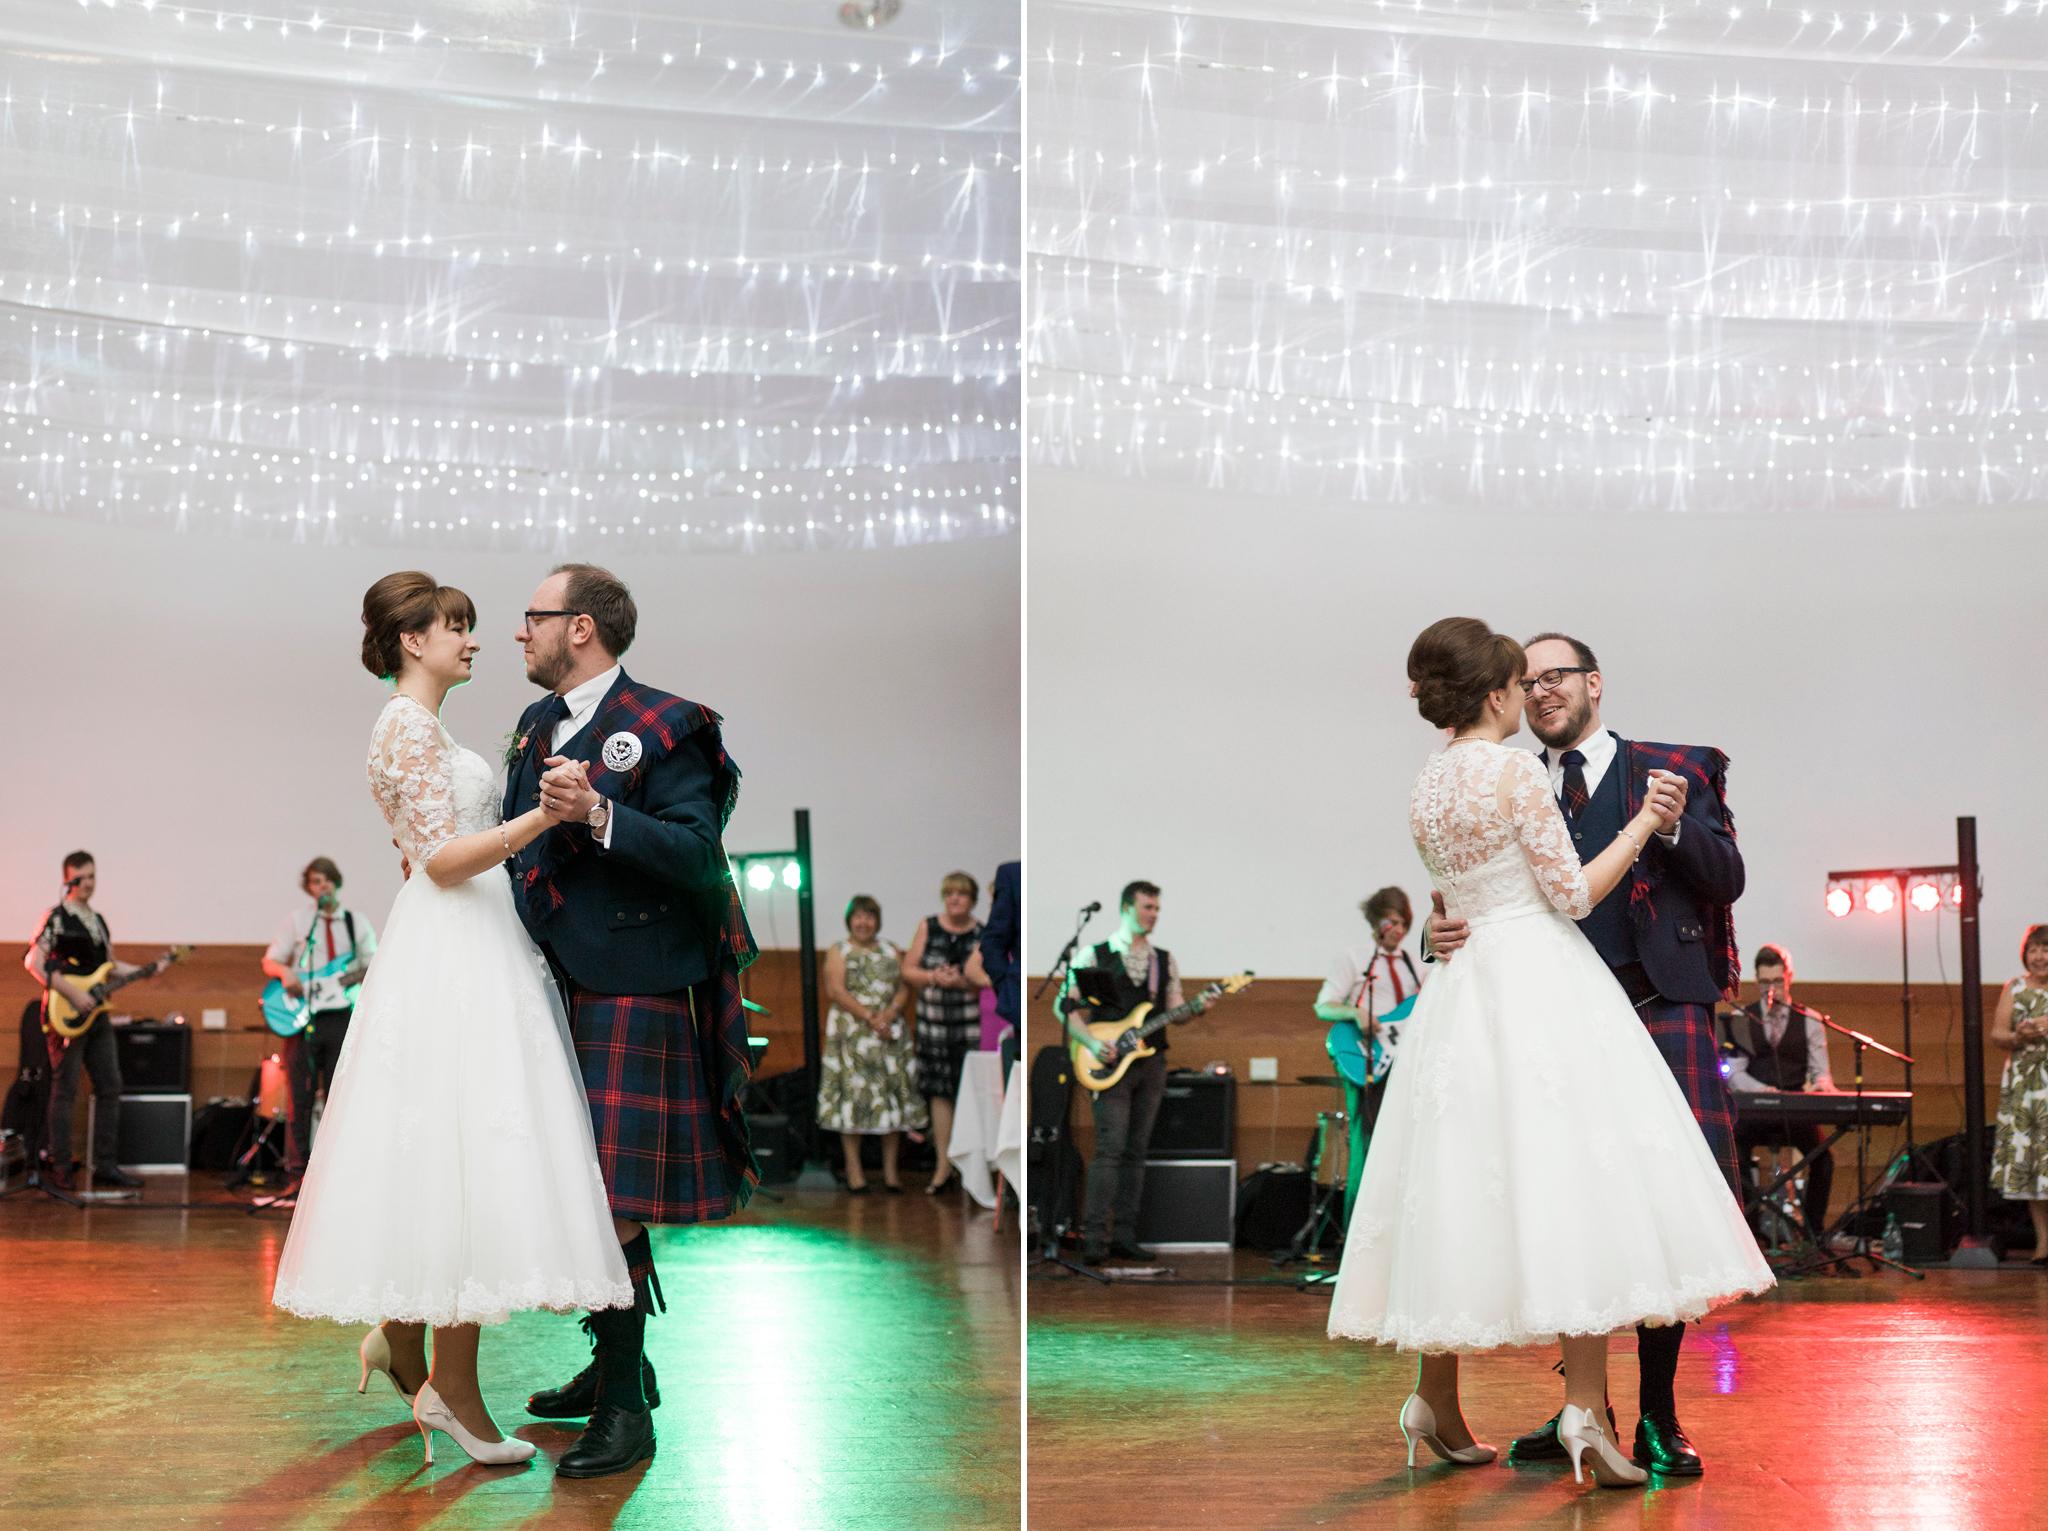 108-desination-wedding-photographer-scotland.jpg